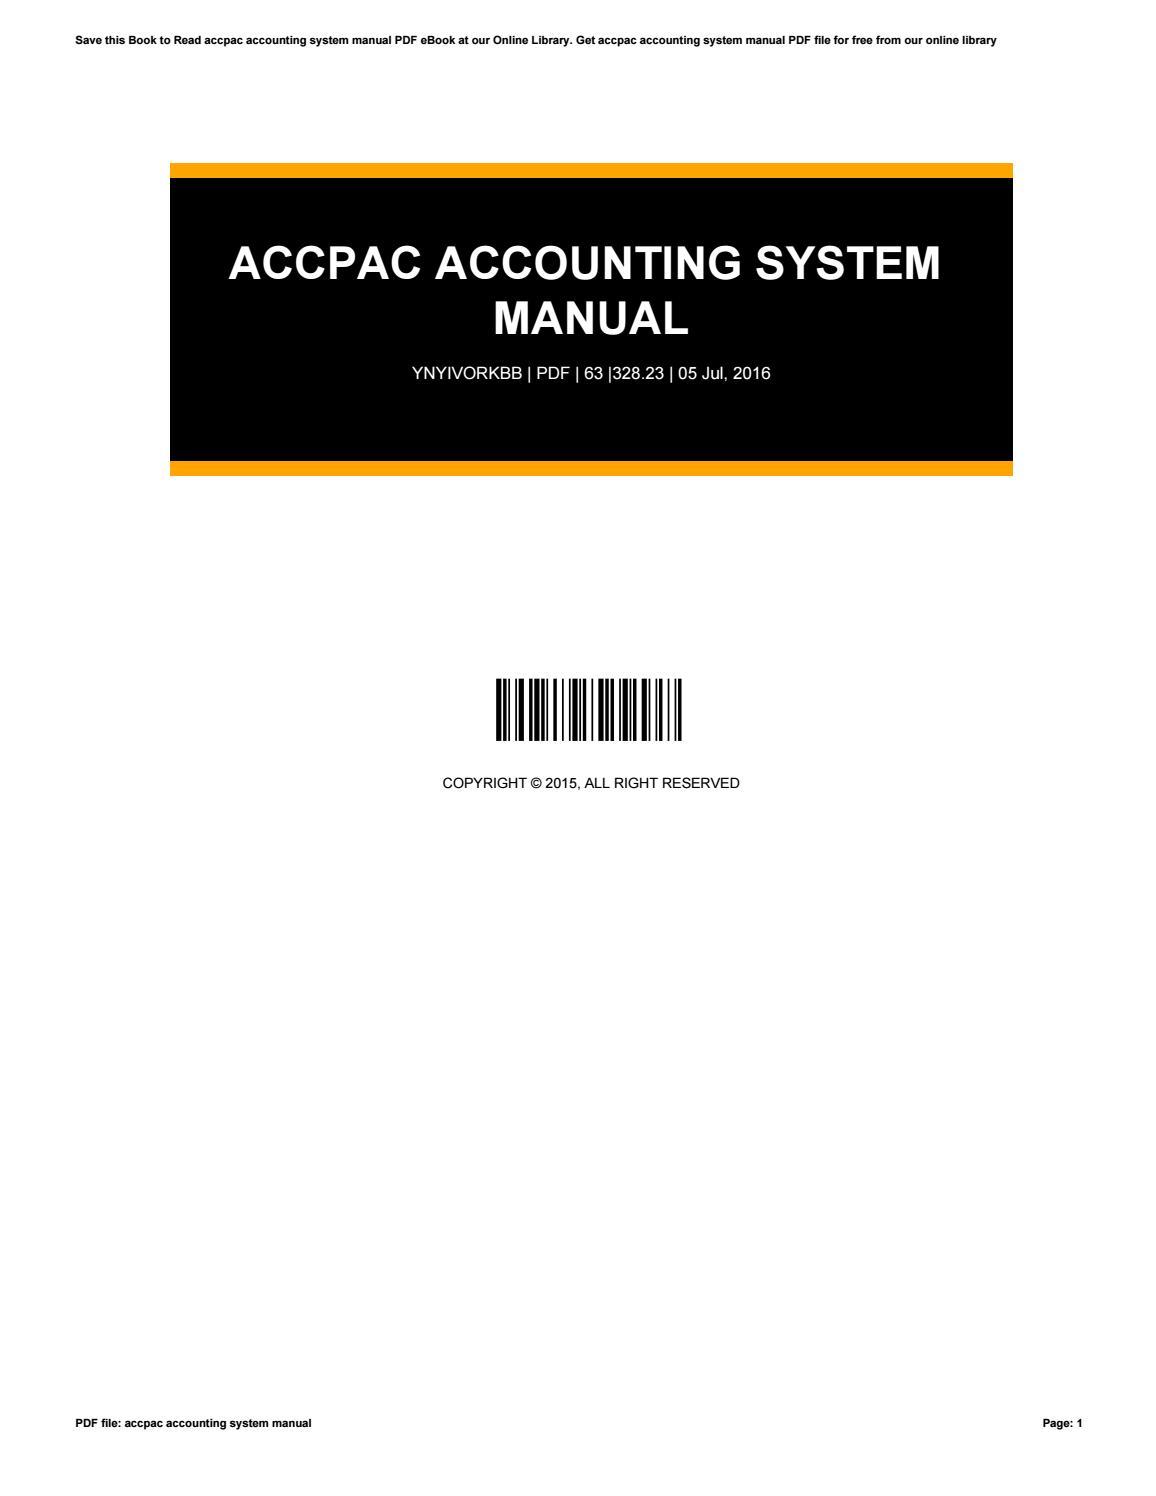 Accpac accounting system manual by Wanda issuu